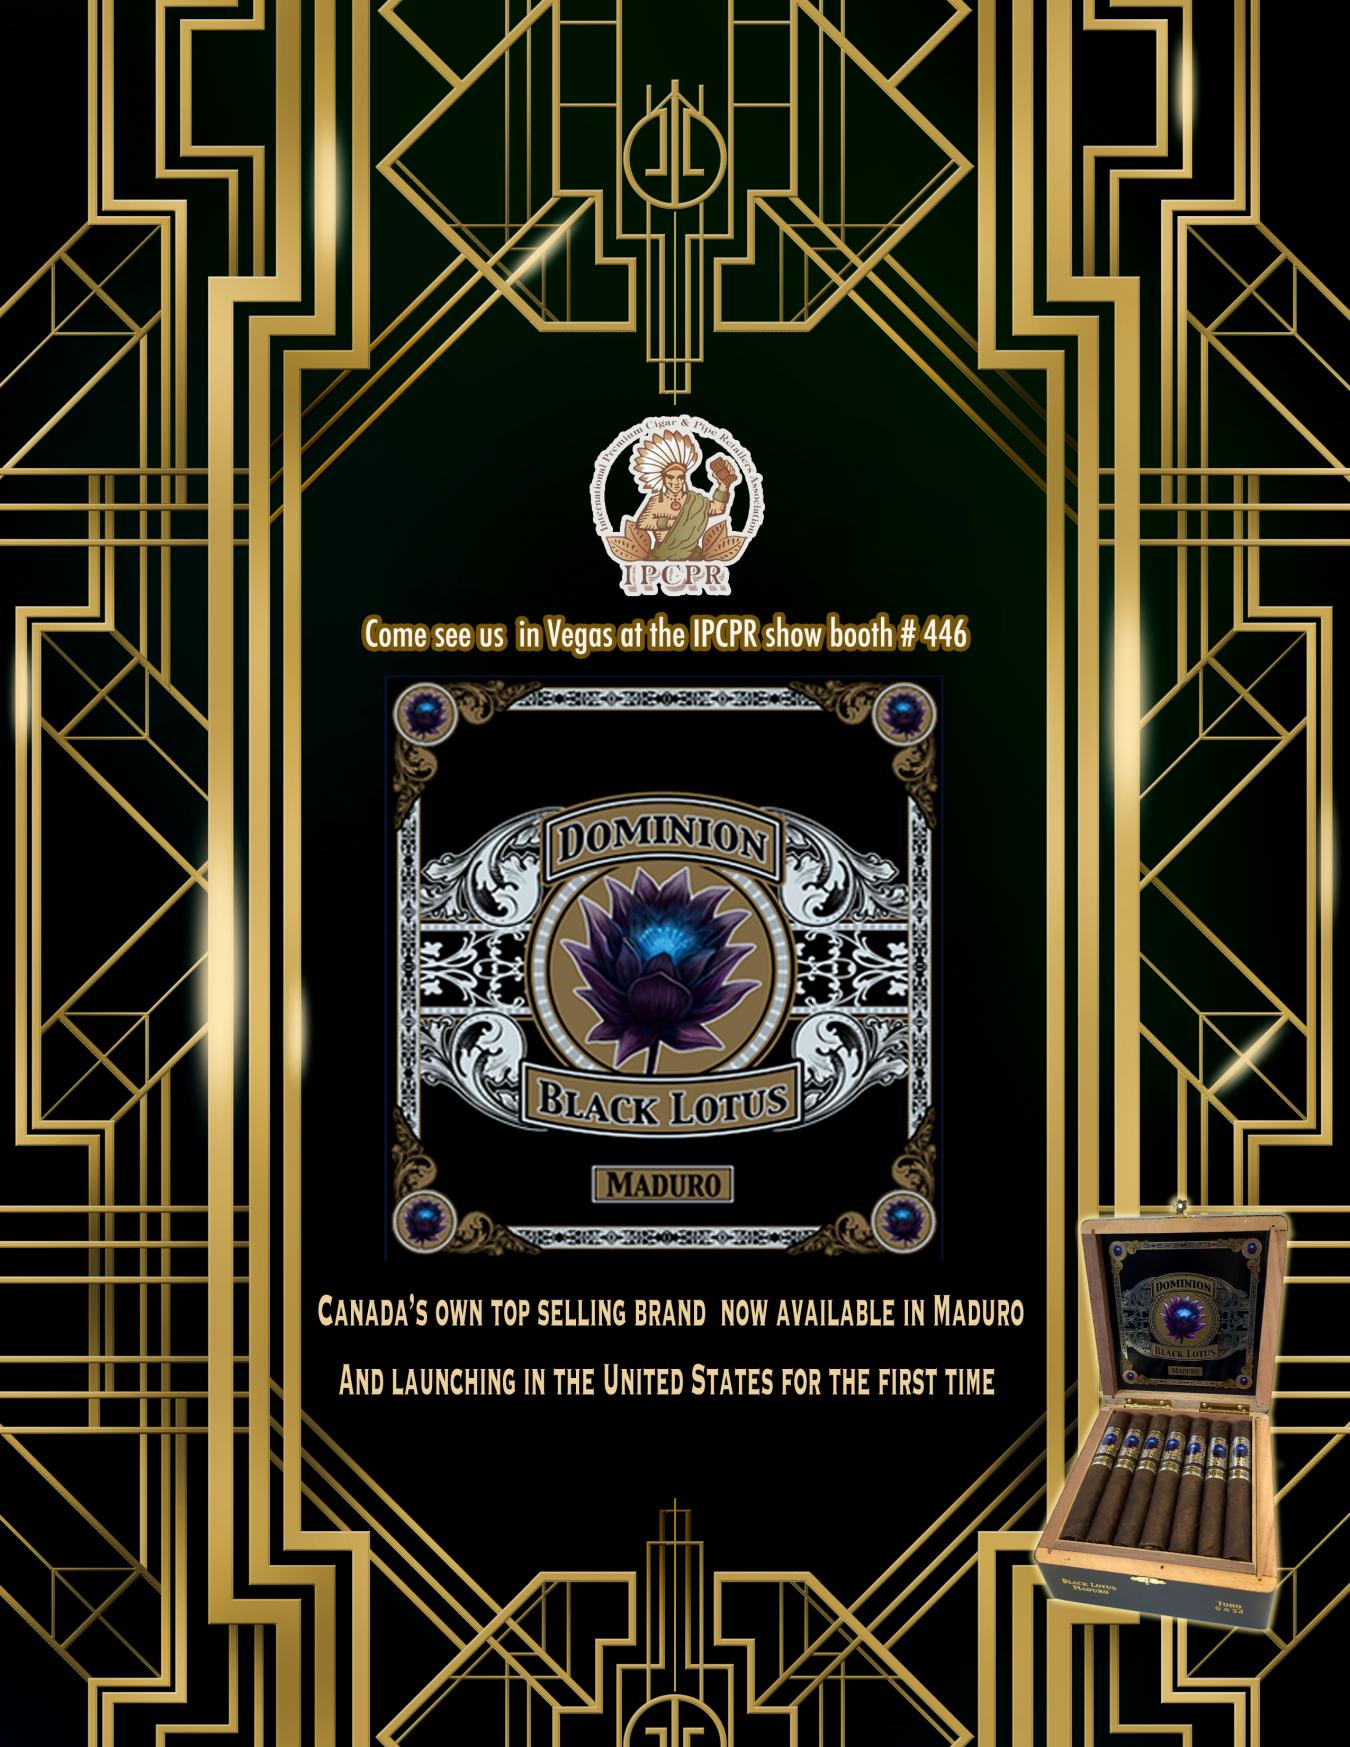 Dominion Black Lotus Moduro web Vegas